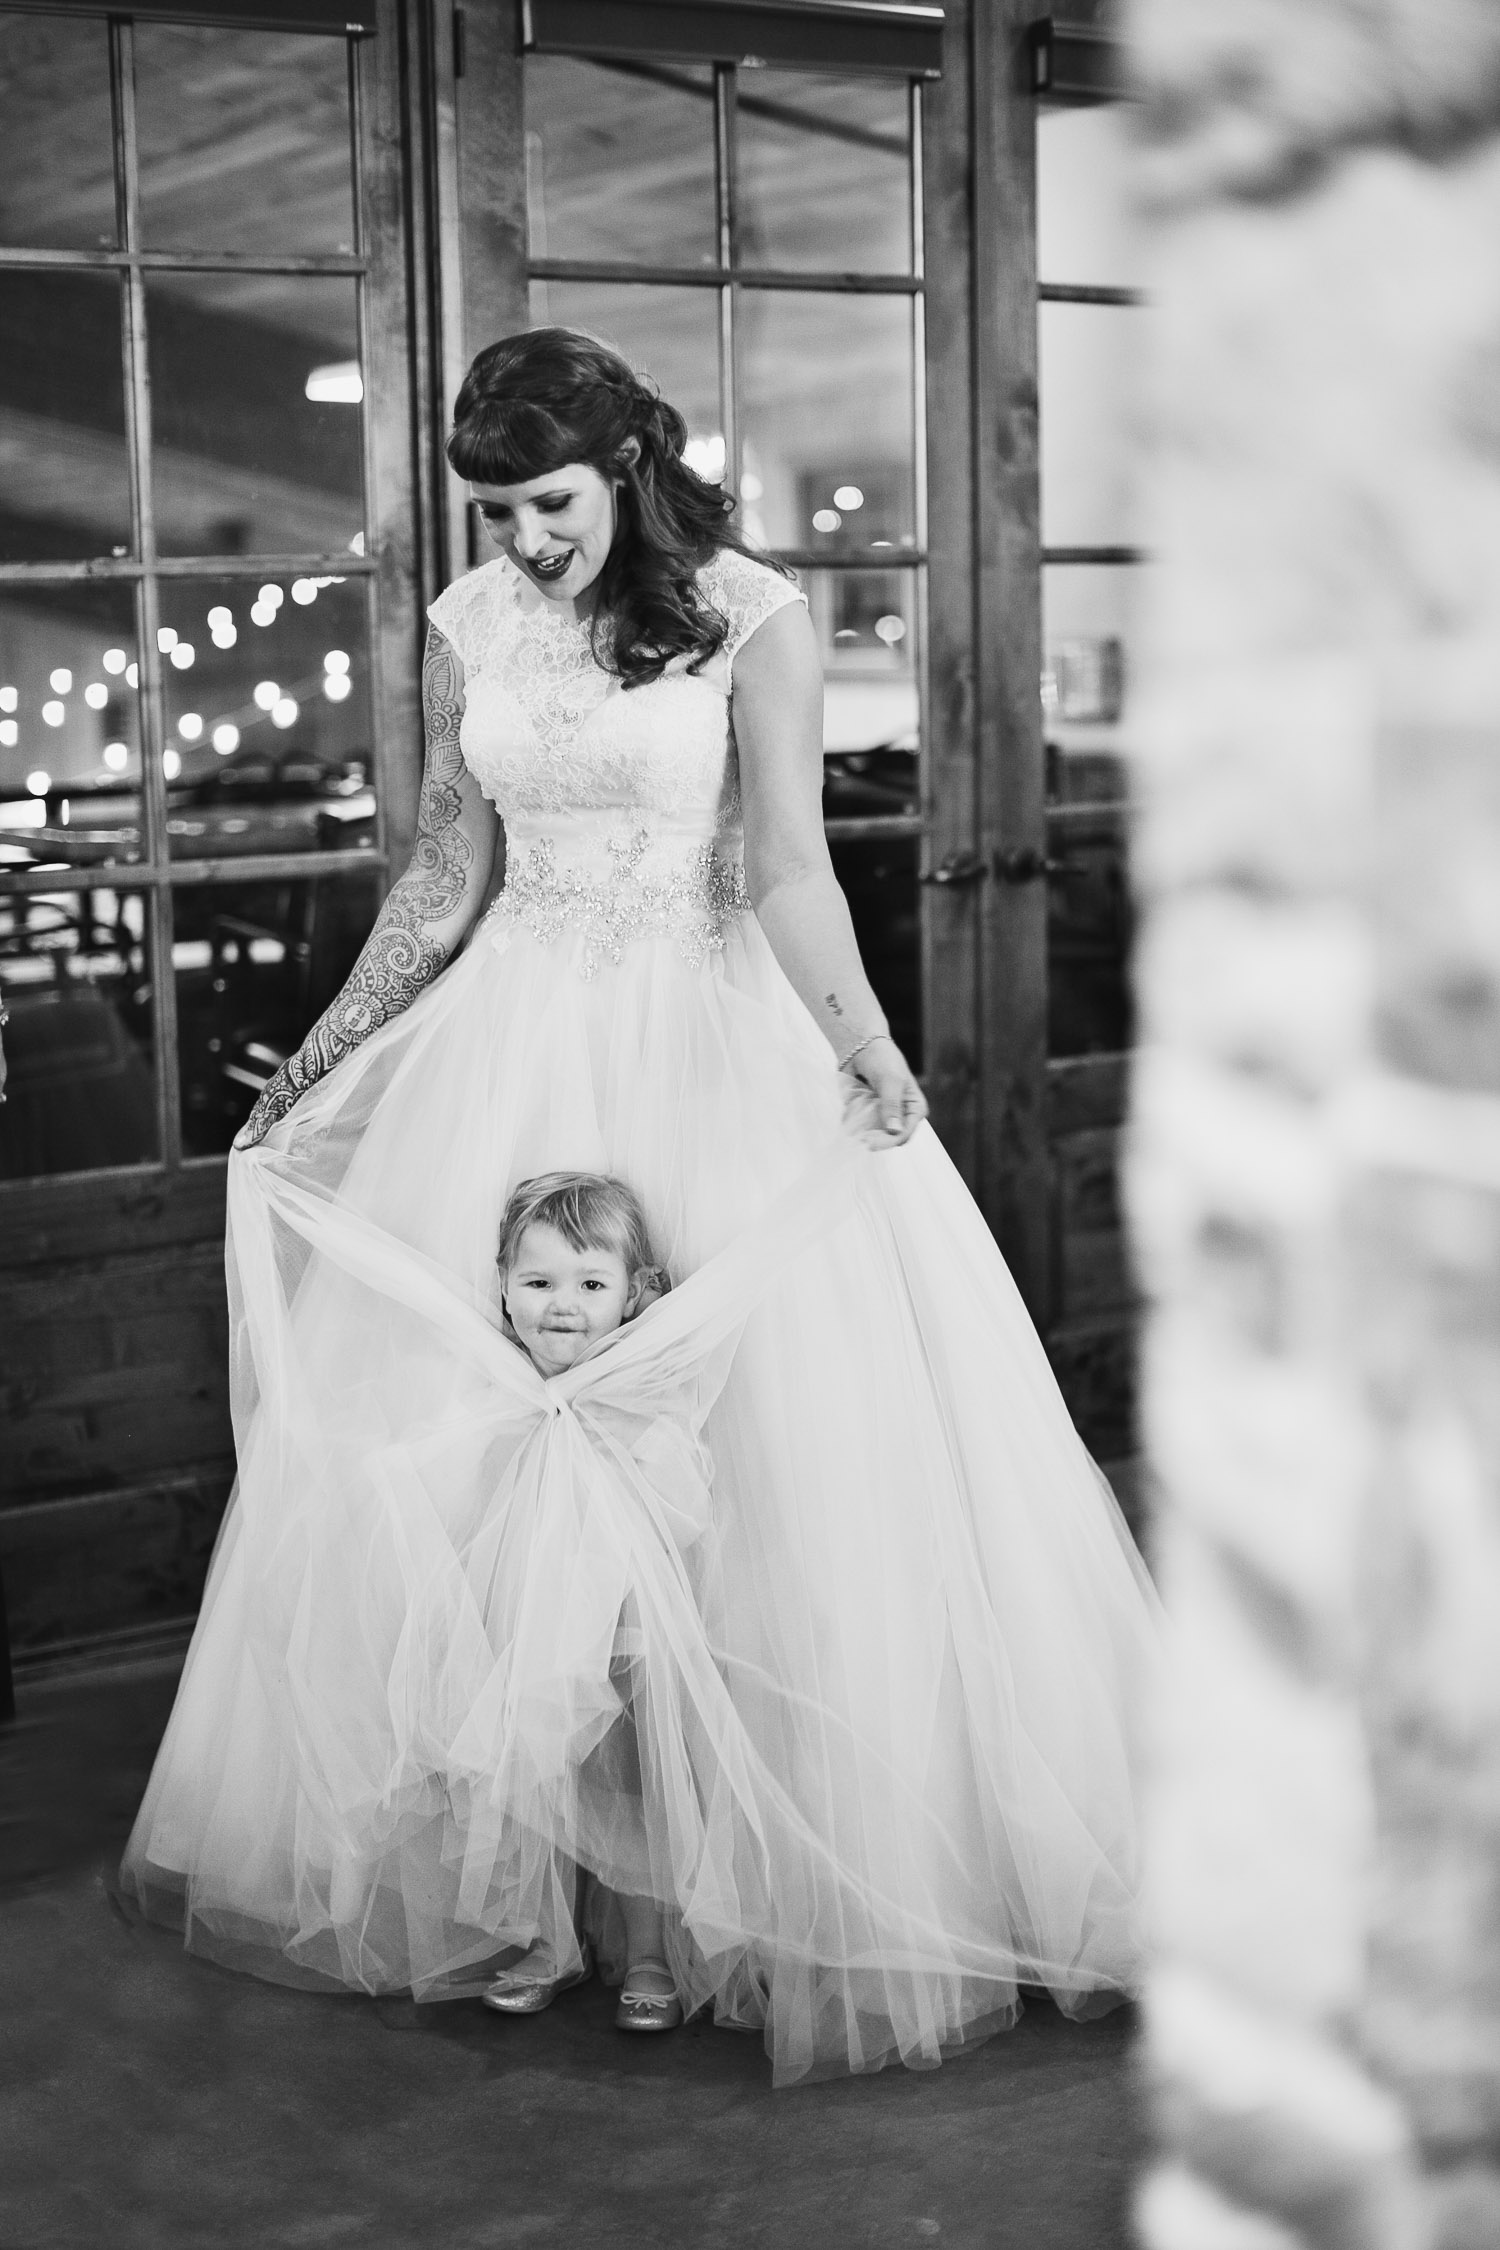 JMPHOTOART-Wedding-Photographer-116.jpg